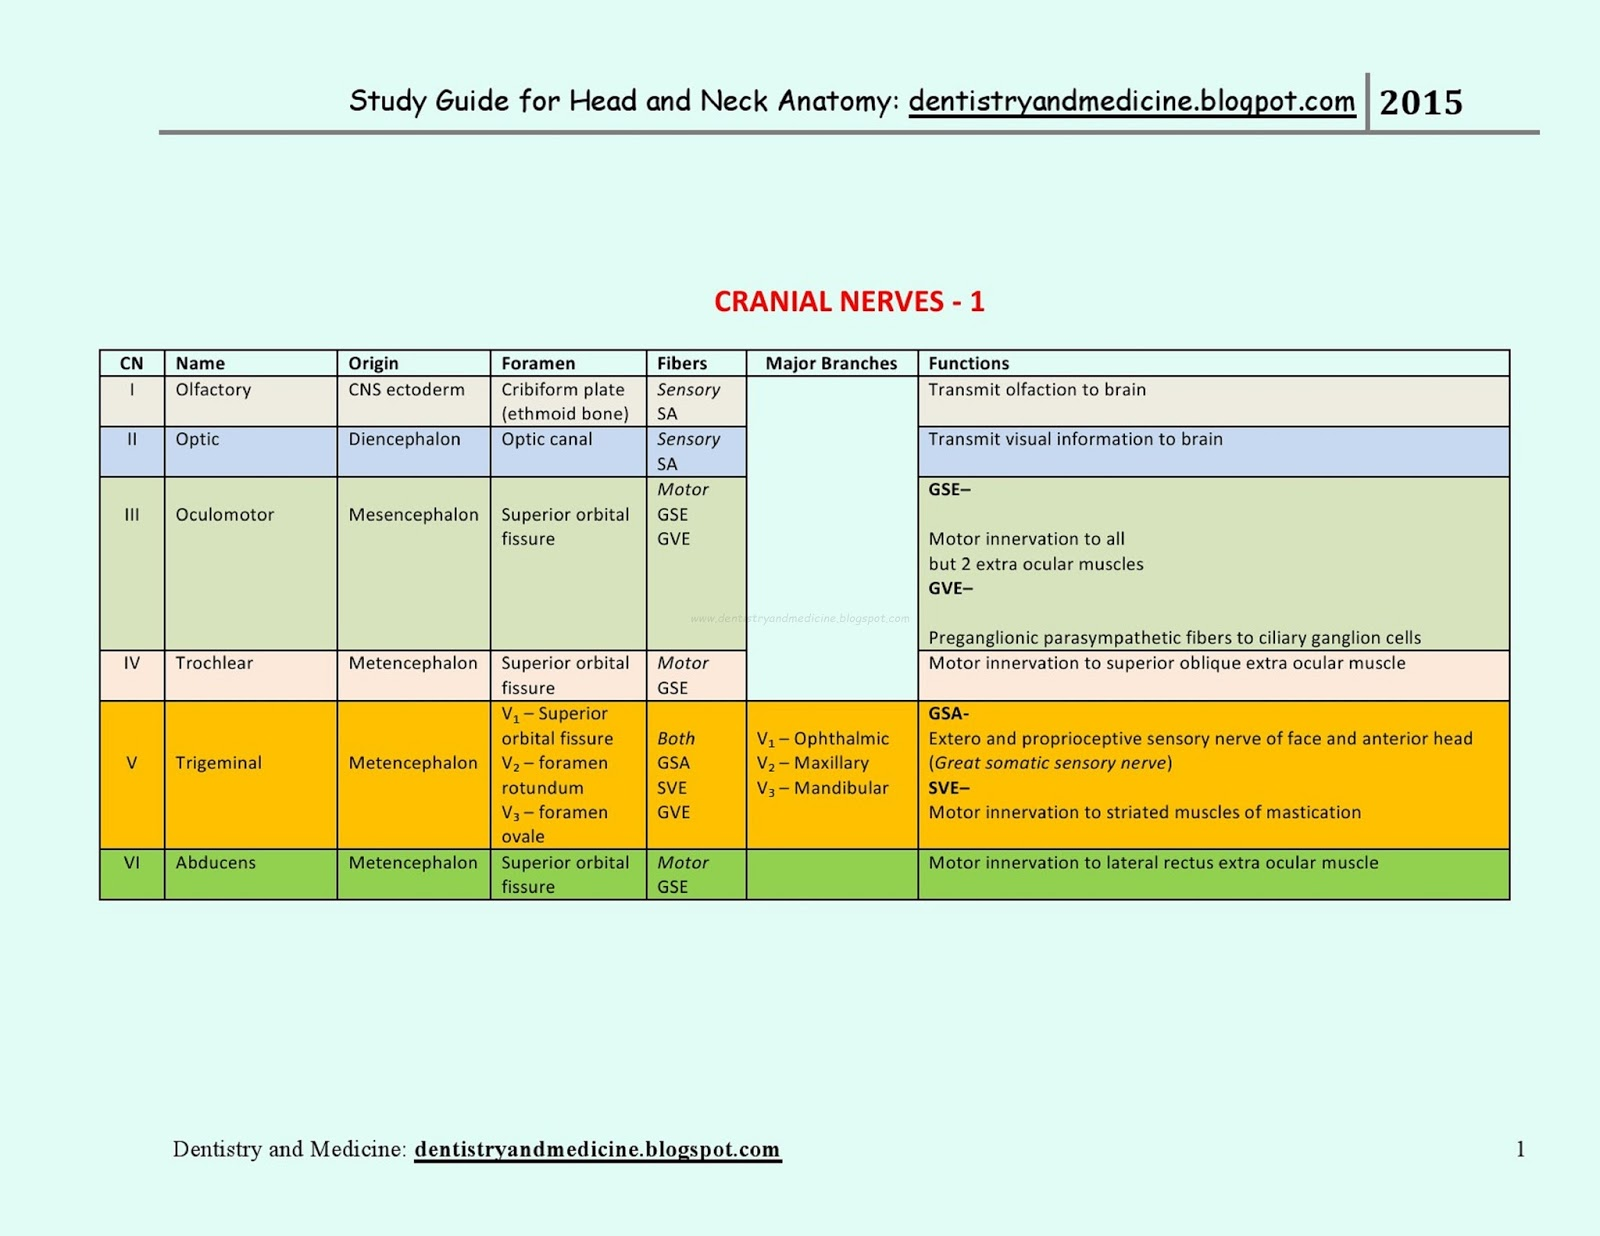 Mnemonics for head and neck anatomy